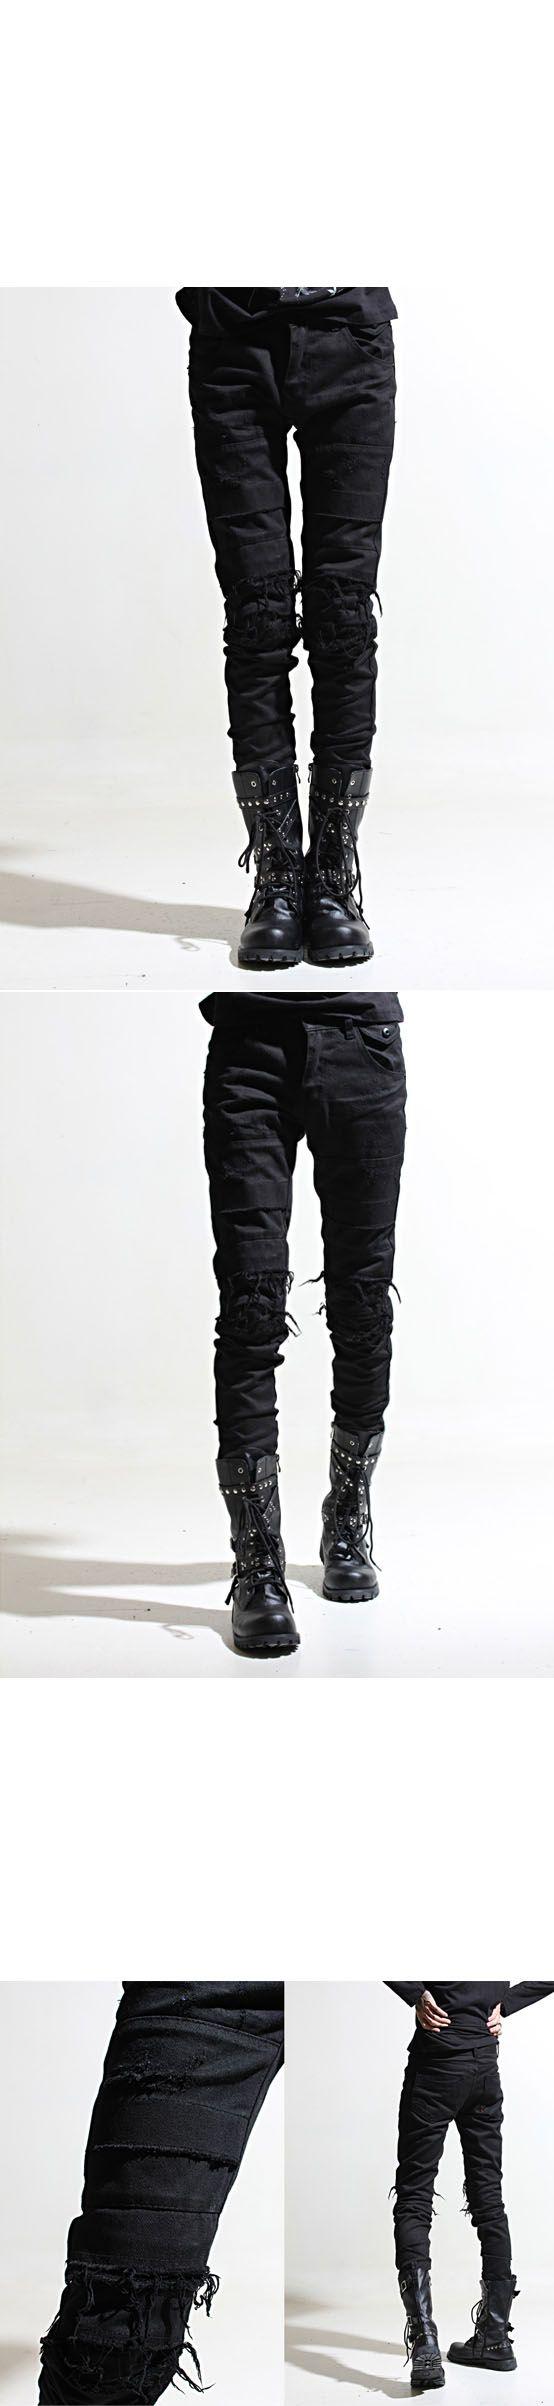 http://www.rebelsmarket.com/products/avant-grade-hardcore-vintage-black-slim-biker-jeans-56865